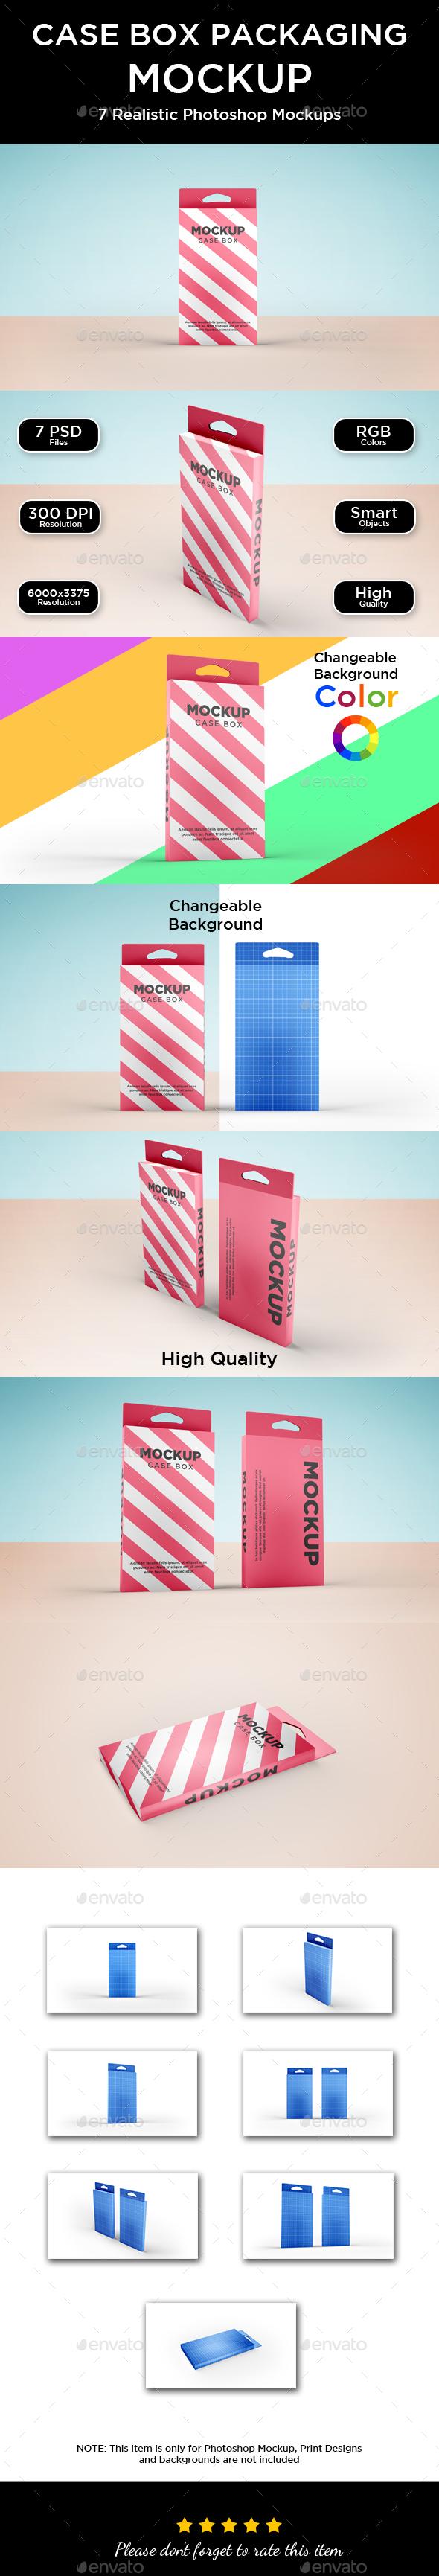 Case Box Packaging Mockup - Packaging Product Mock-Ups